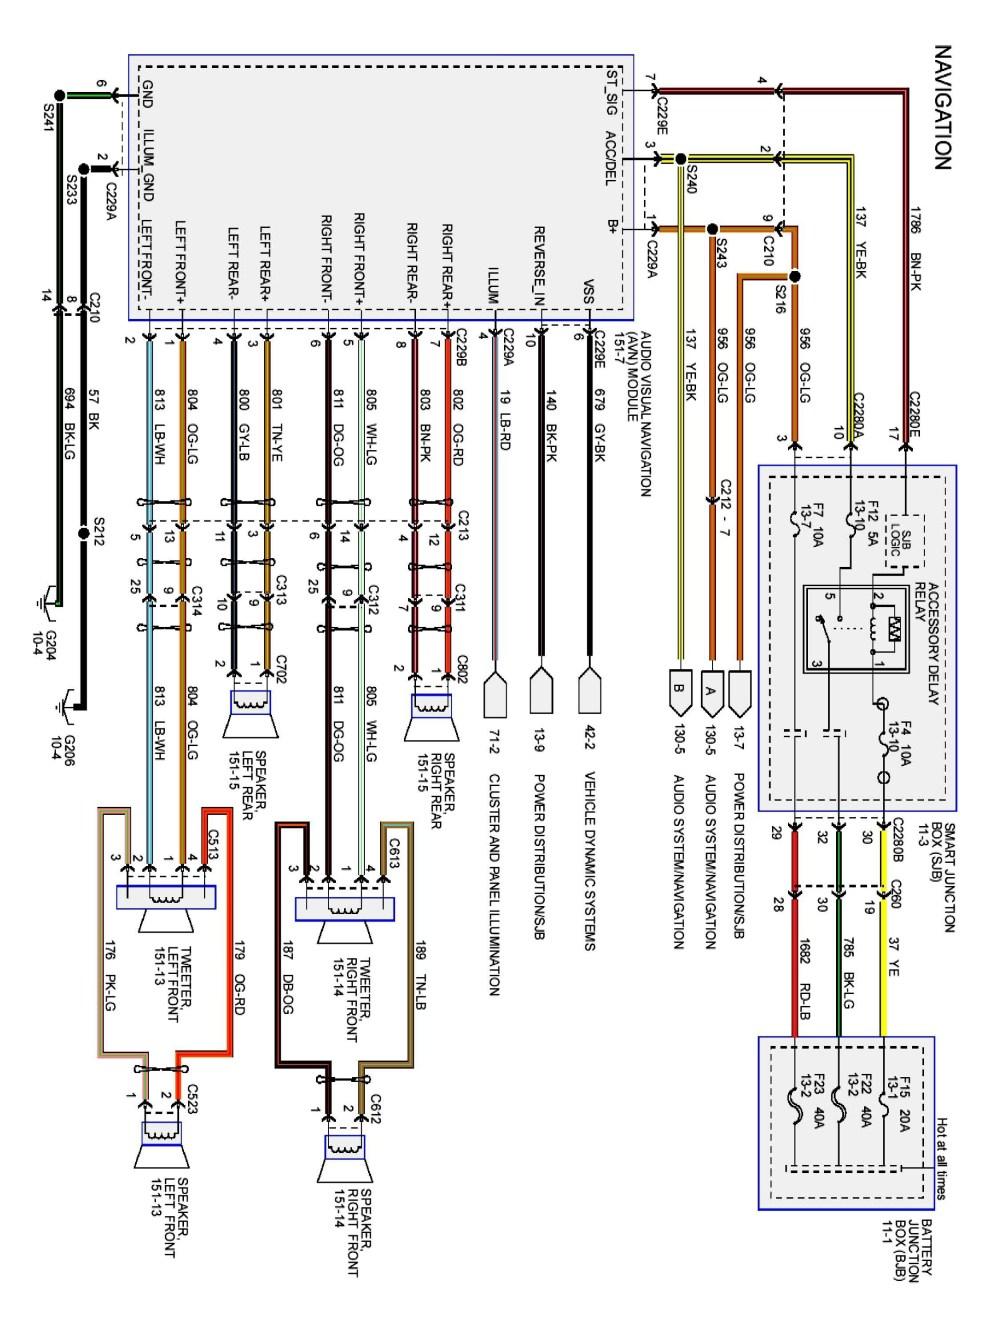 medium resolution of 98 f150 wiring diagram 01 03 ford f 150 wiring diagram trusted wiring diagram of 98